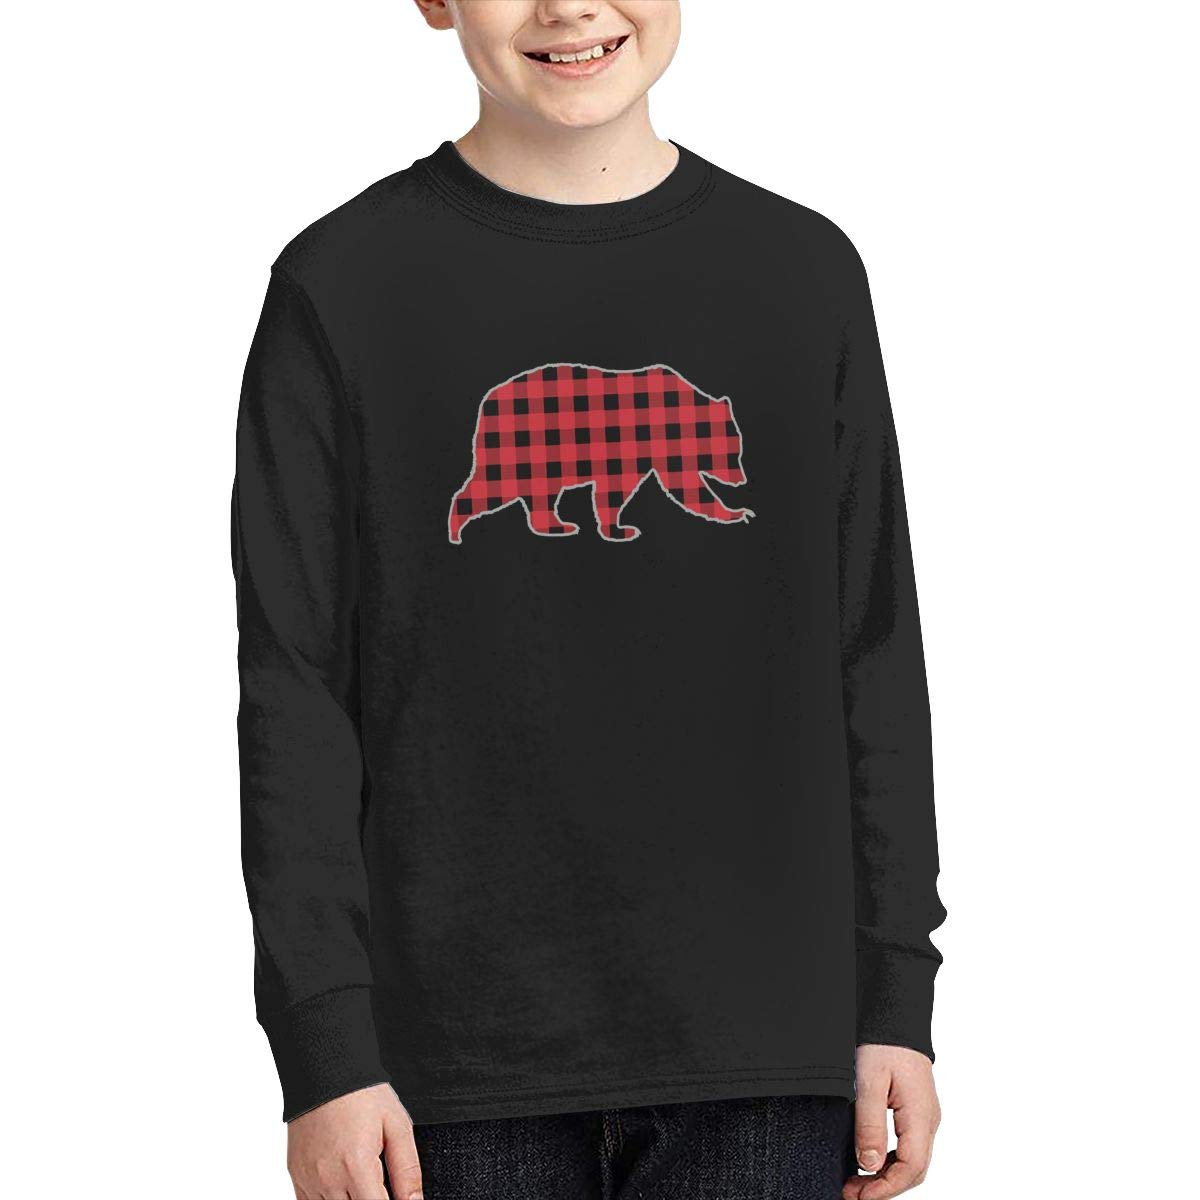 Bear Buffalo Plaid Family Christmas Present Youth T Shirts Boy's Youth Tees Long Sleeve 100% Coton YOKOL